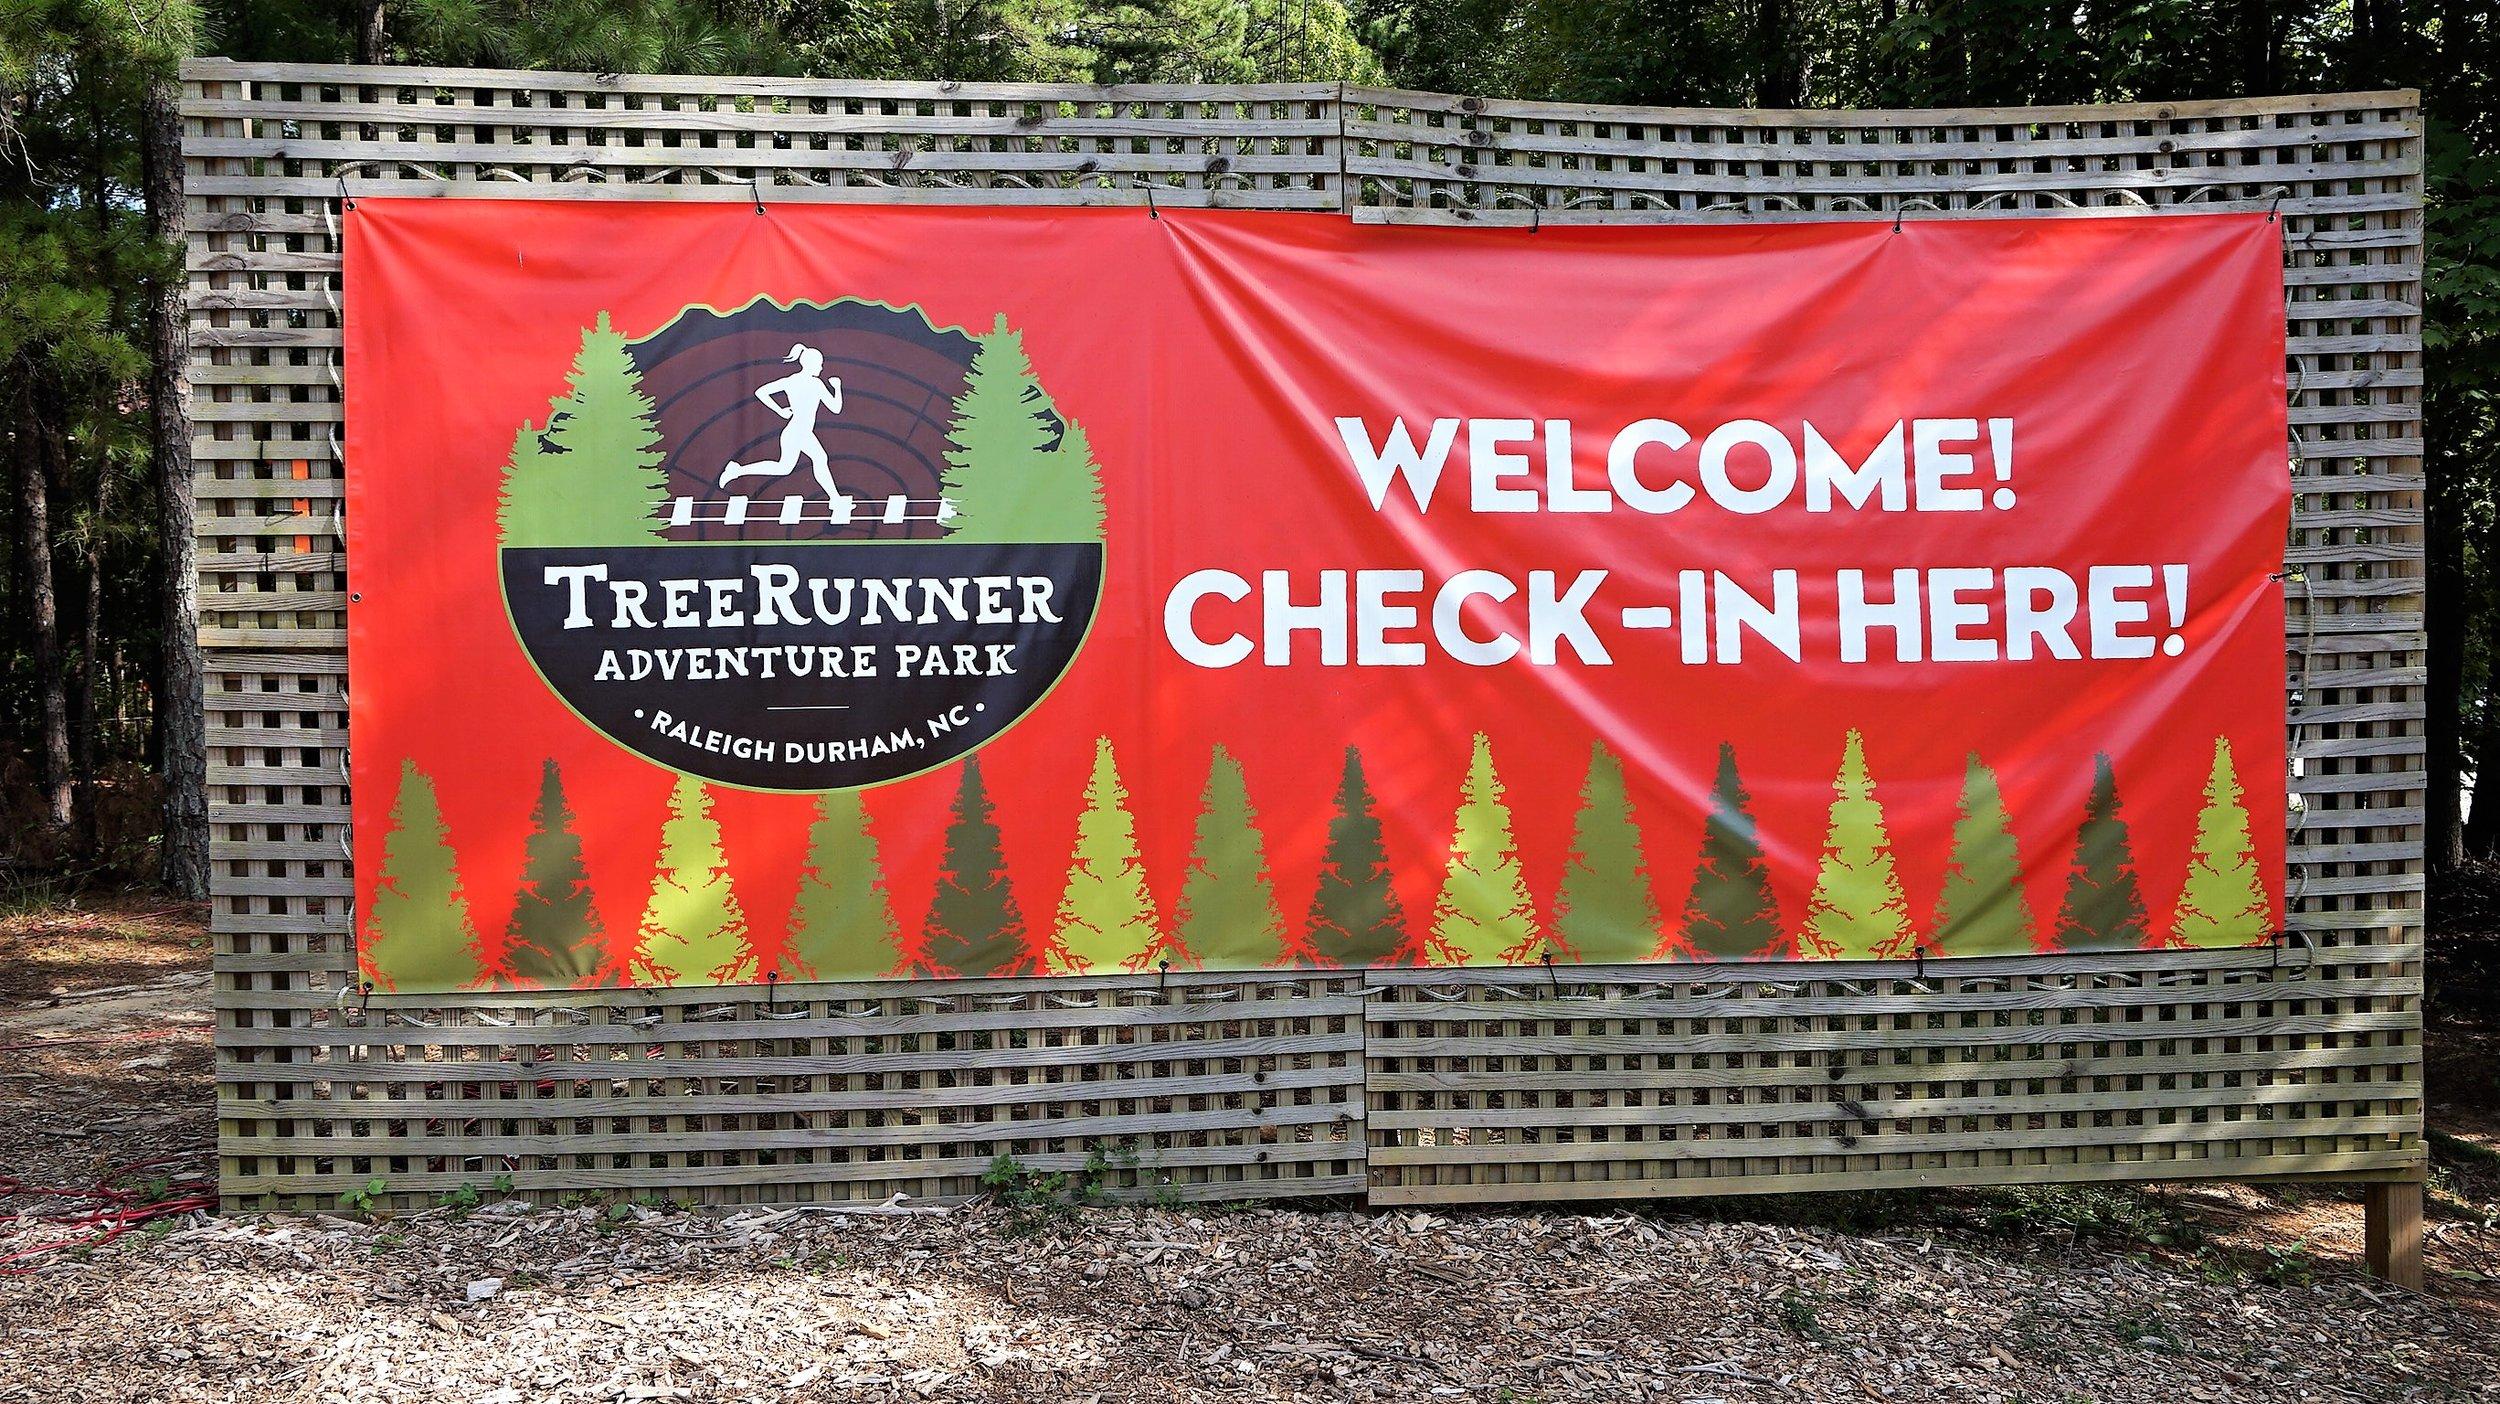 TreeRunner Adventure Park Raleigh